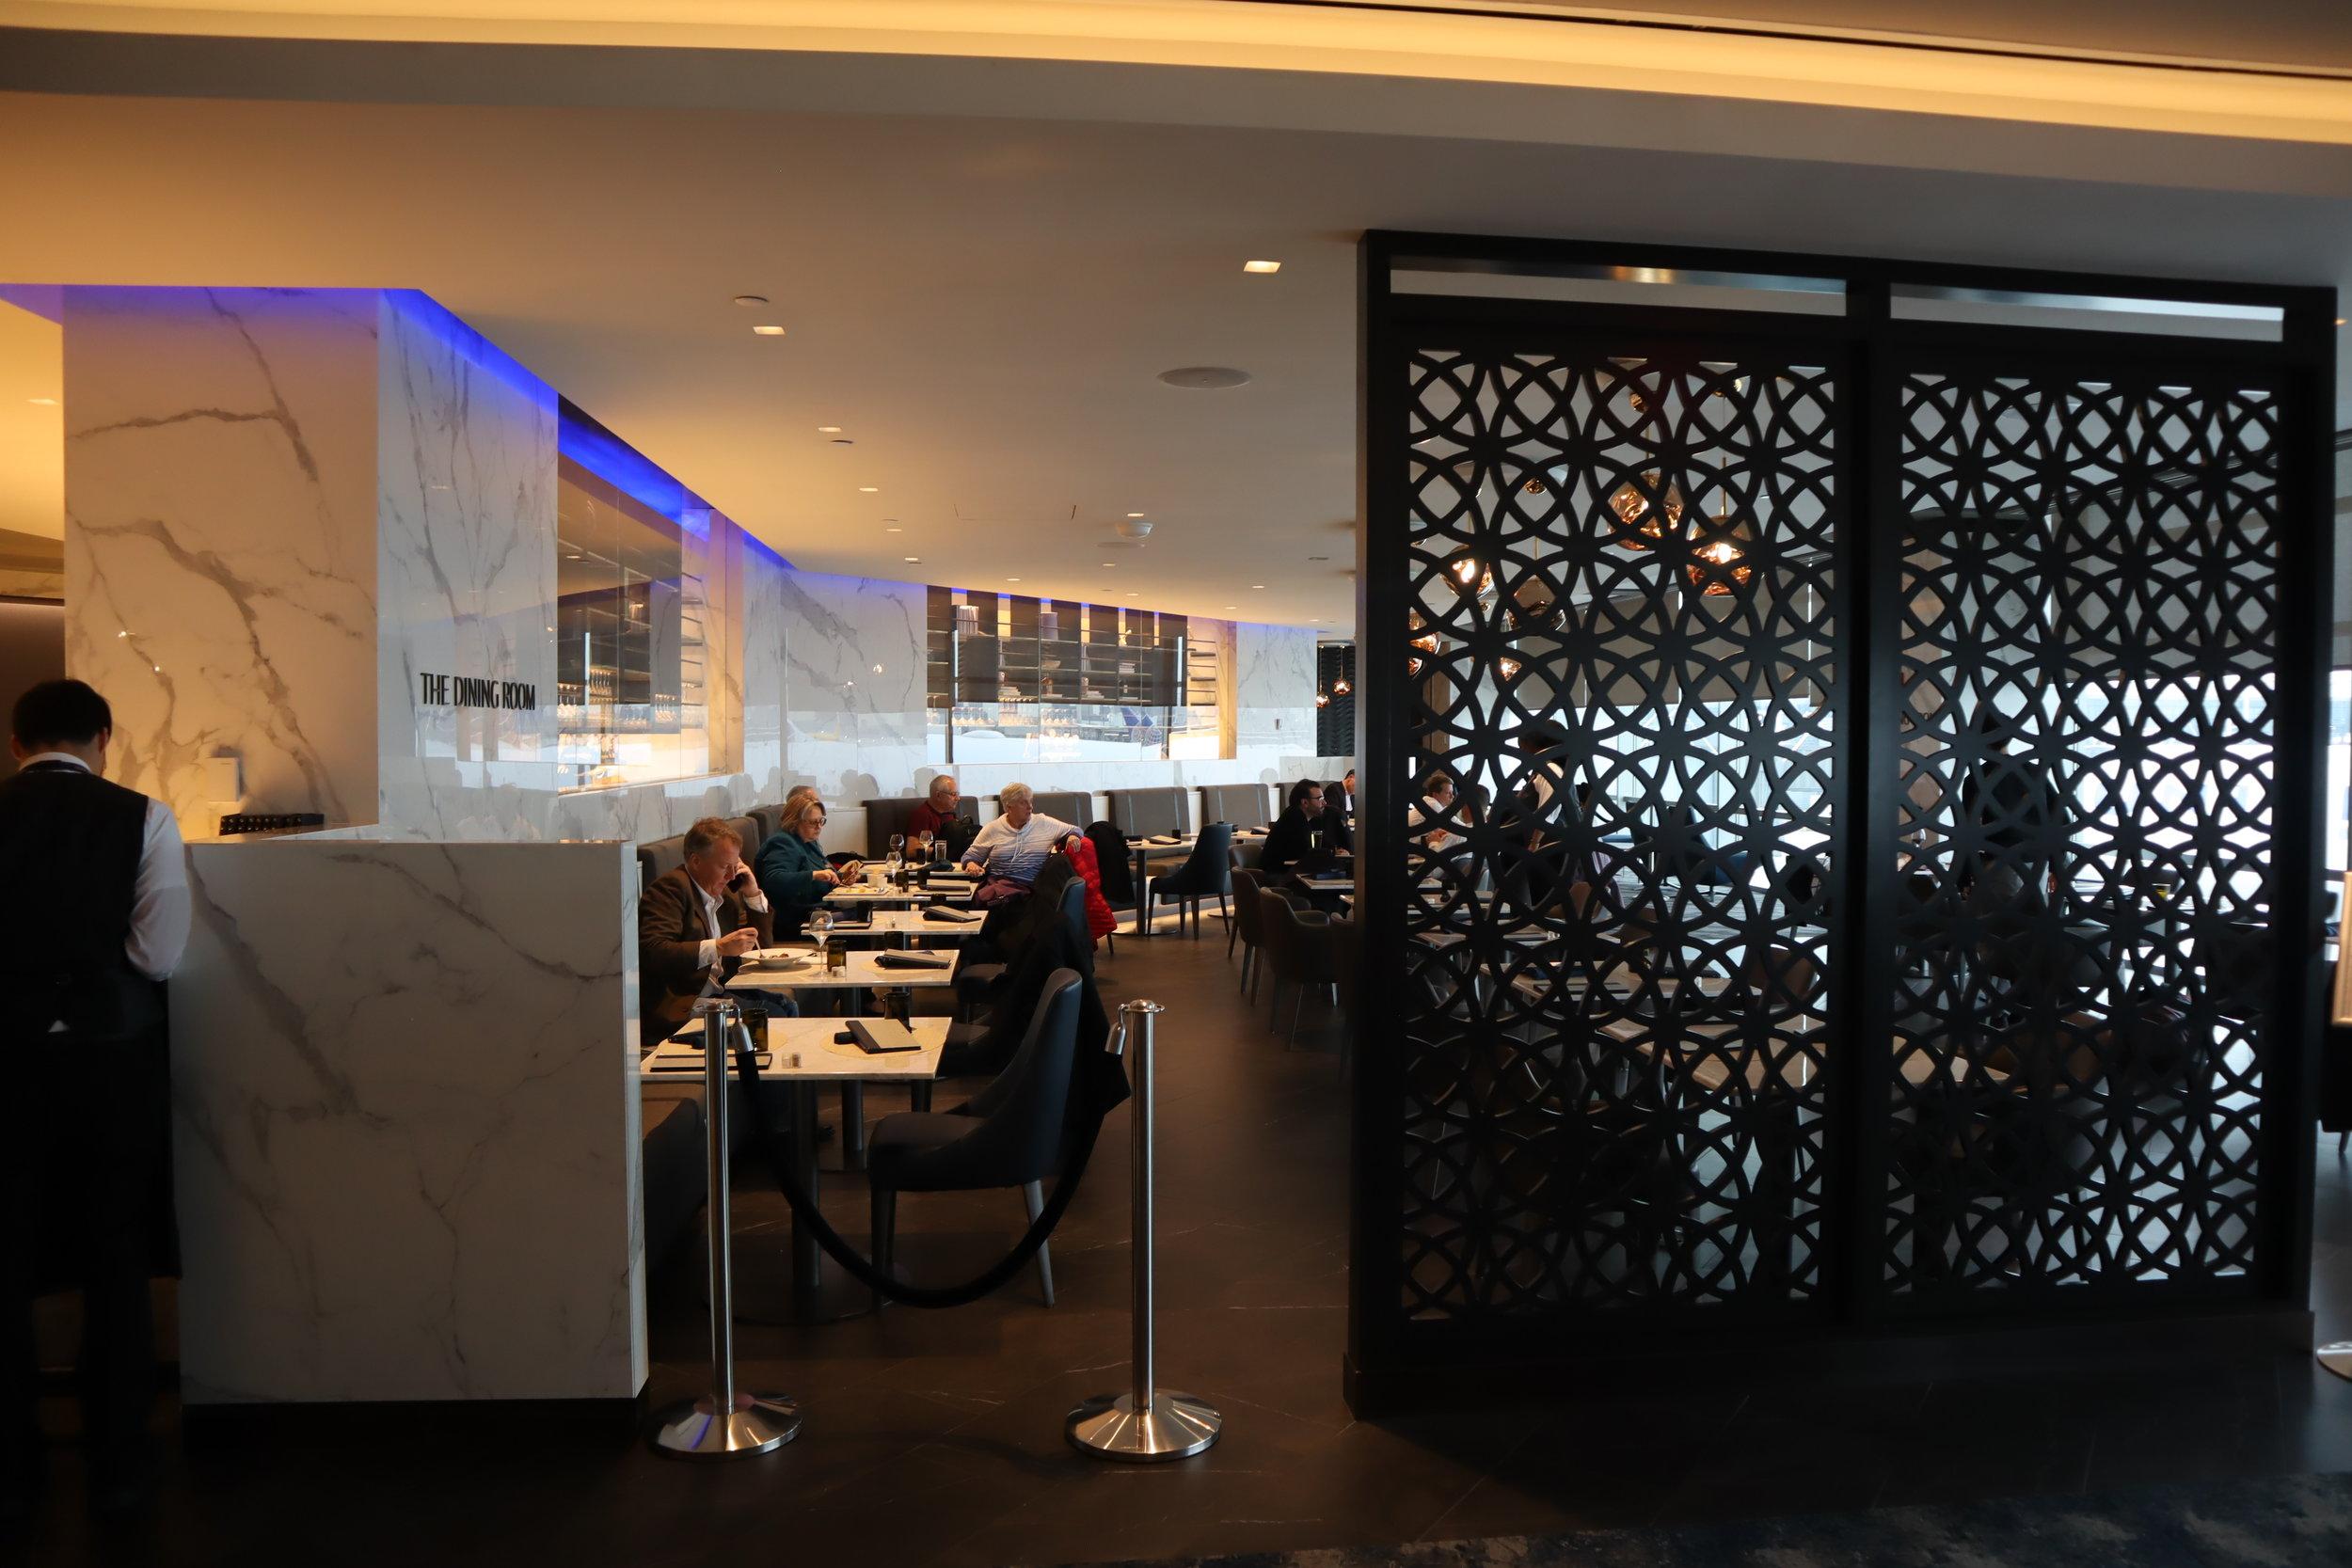 United Polaris Lounge Newark – The Dining Room